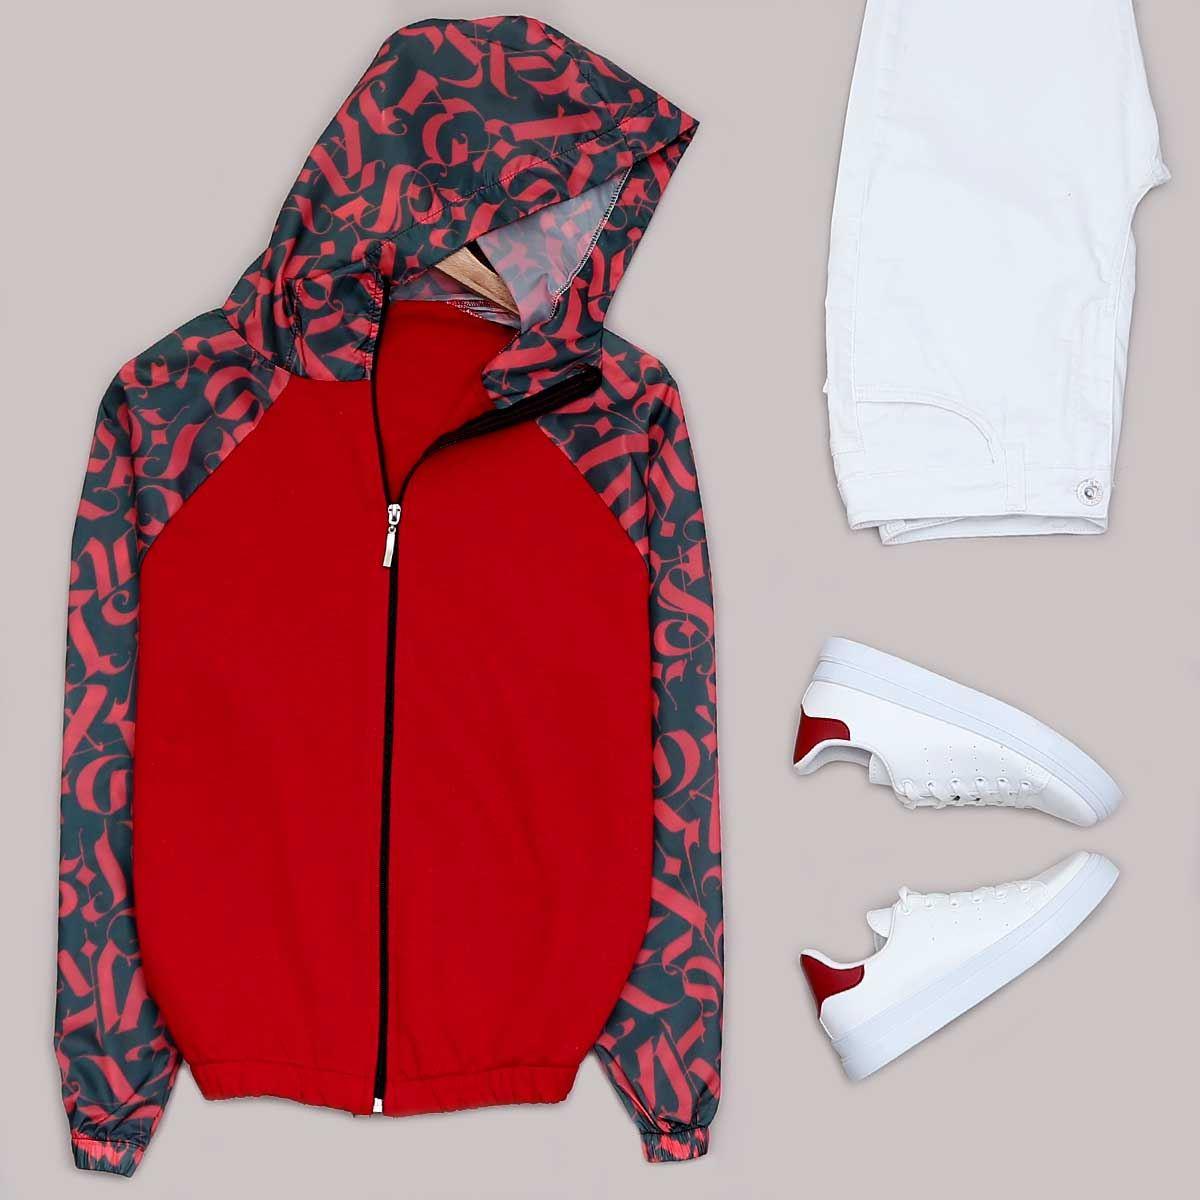 Kırmızı Kapşonlu Ceket CKT148